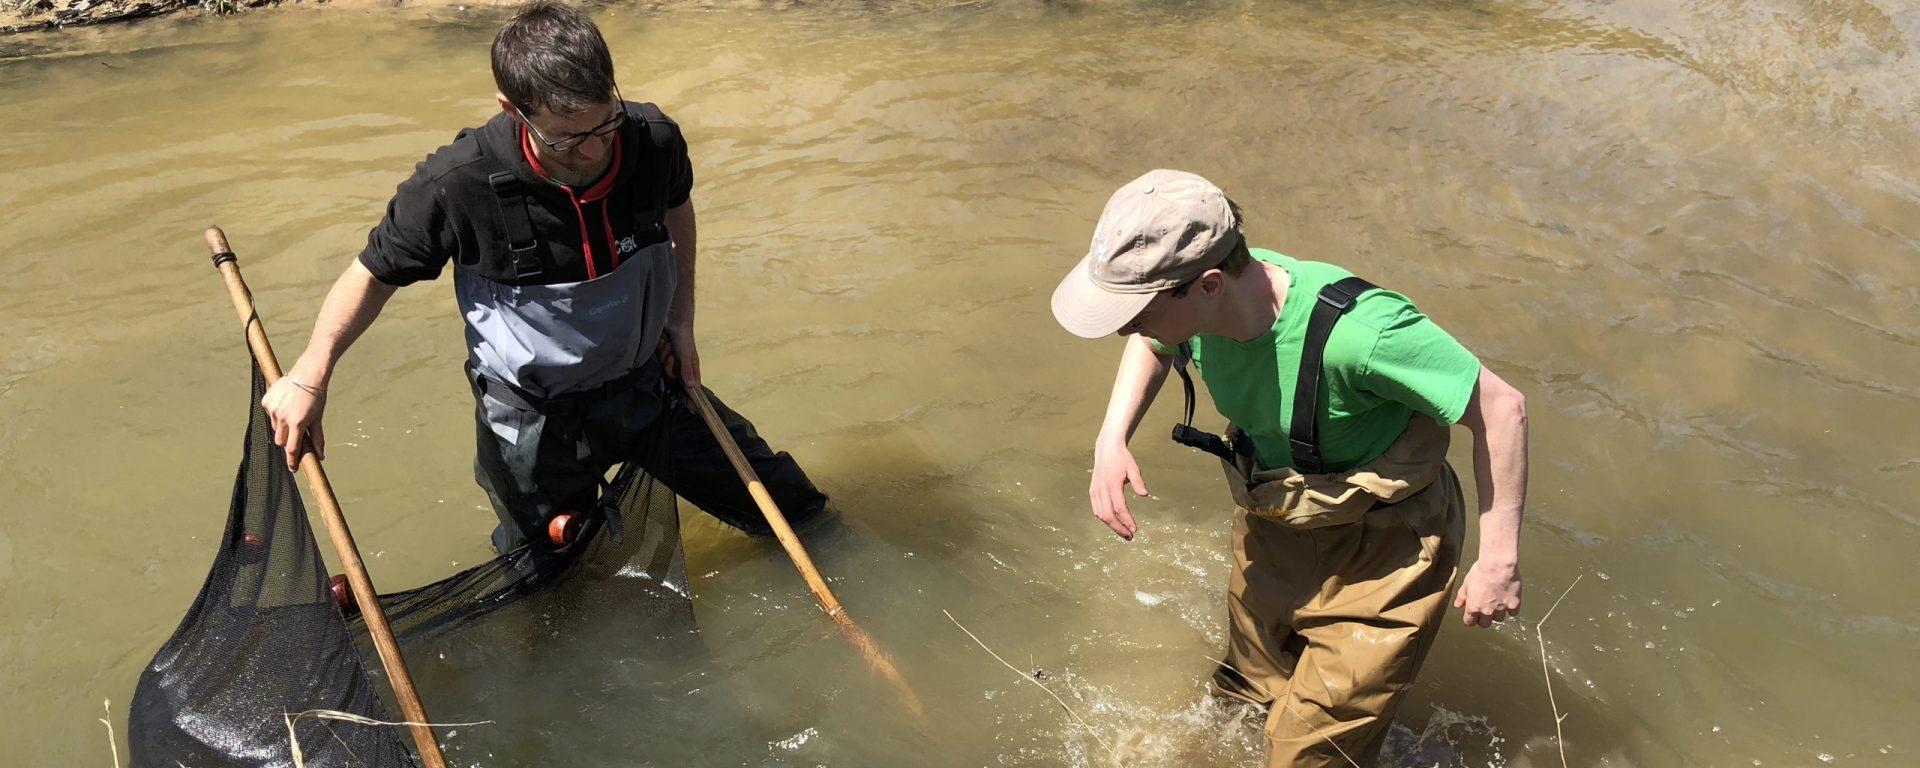 two men seine fishing in a stream